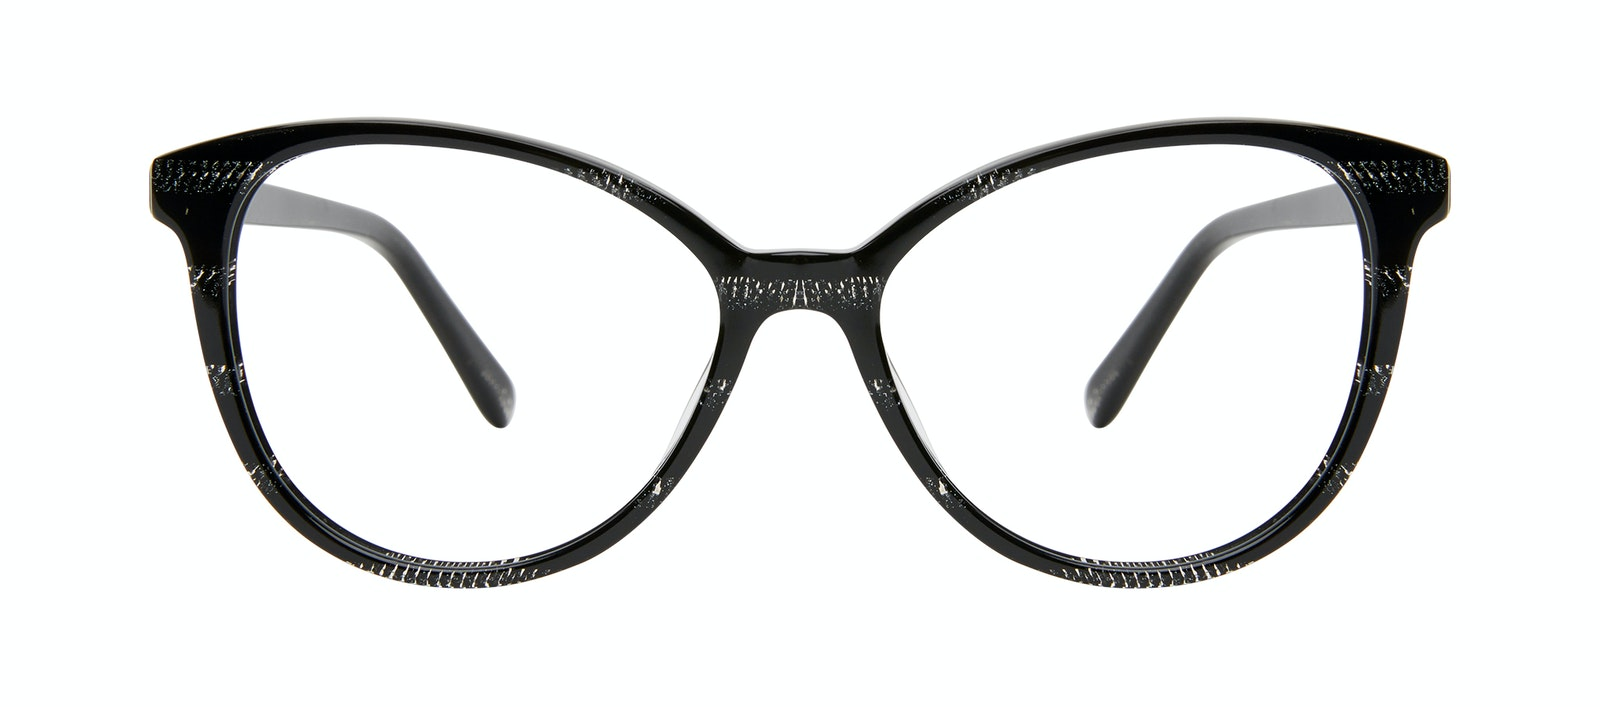 Affordable Fashion Glasses Cat Eye Eyeglasses Women Esprit L Night Front